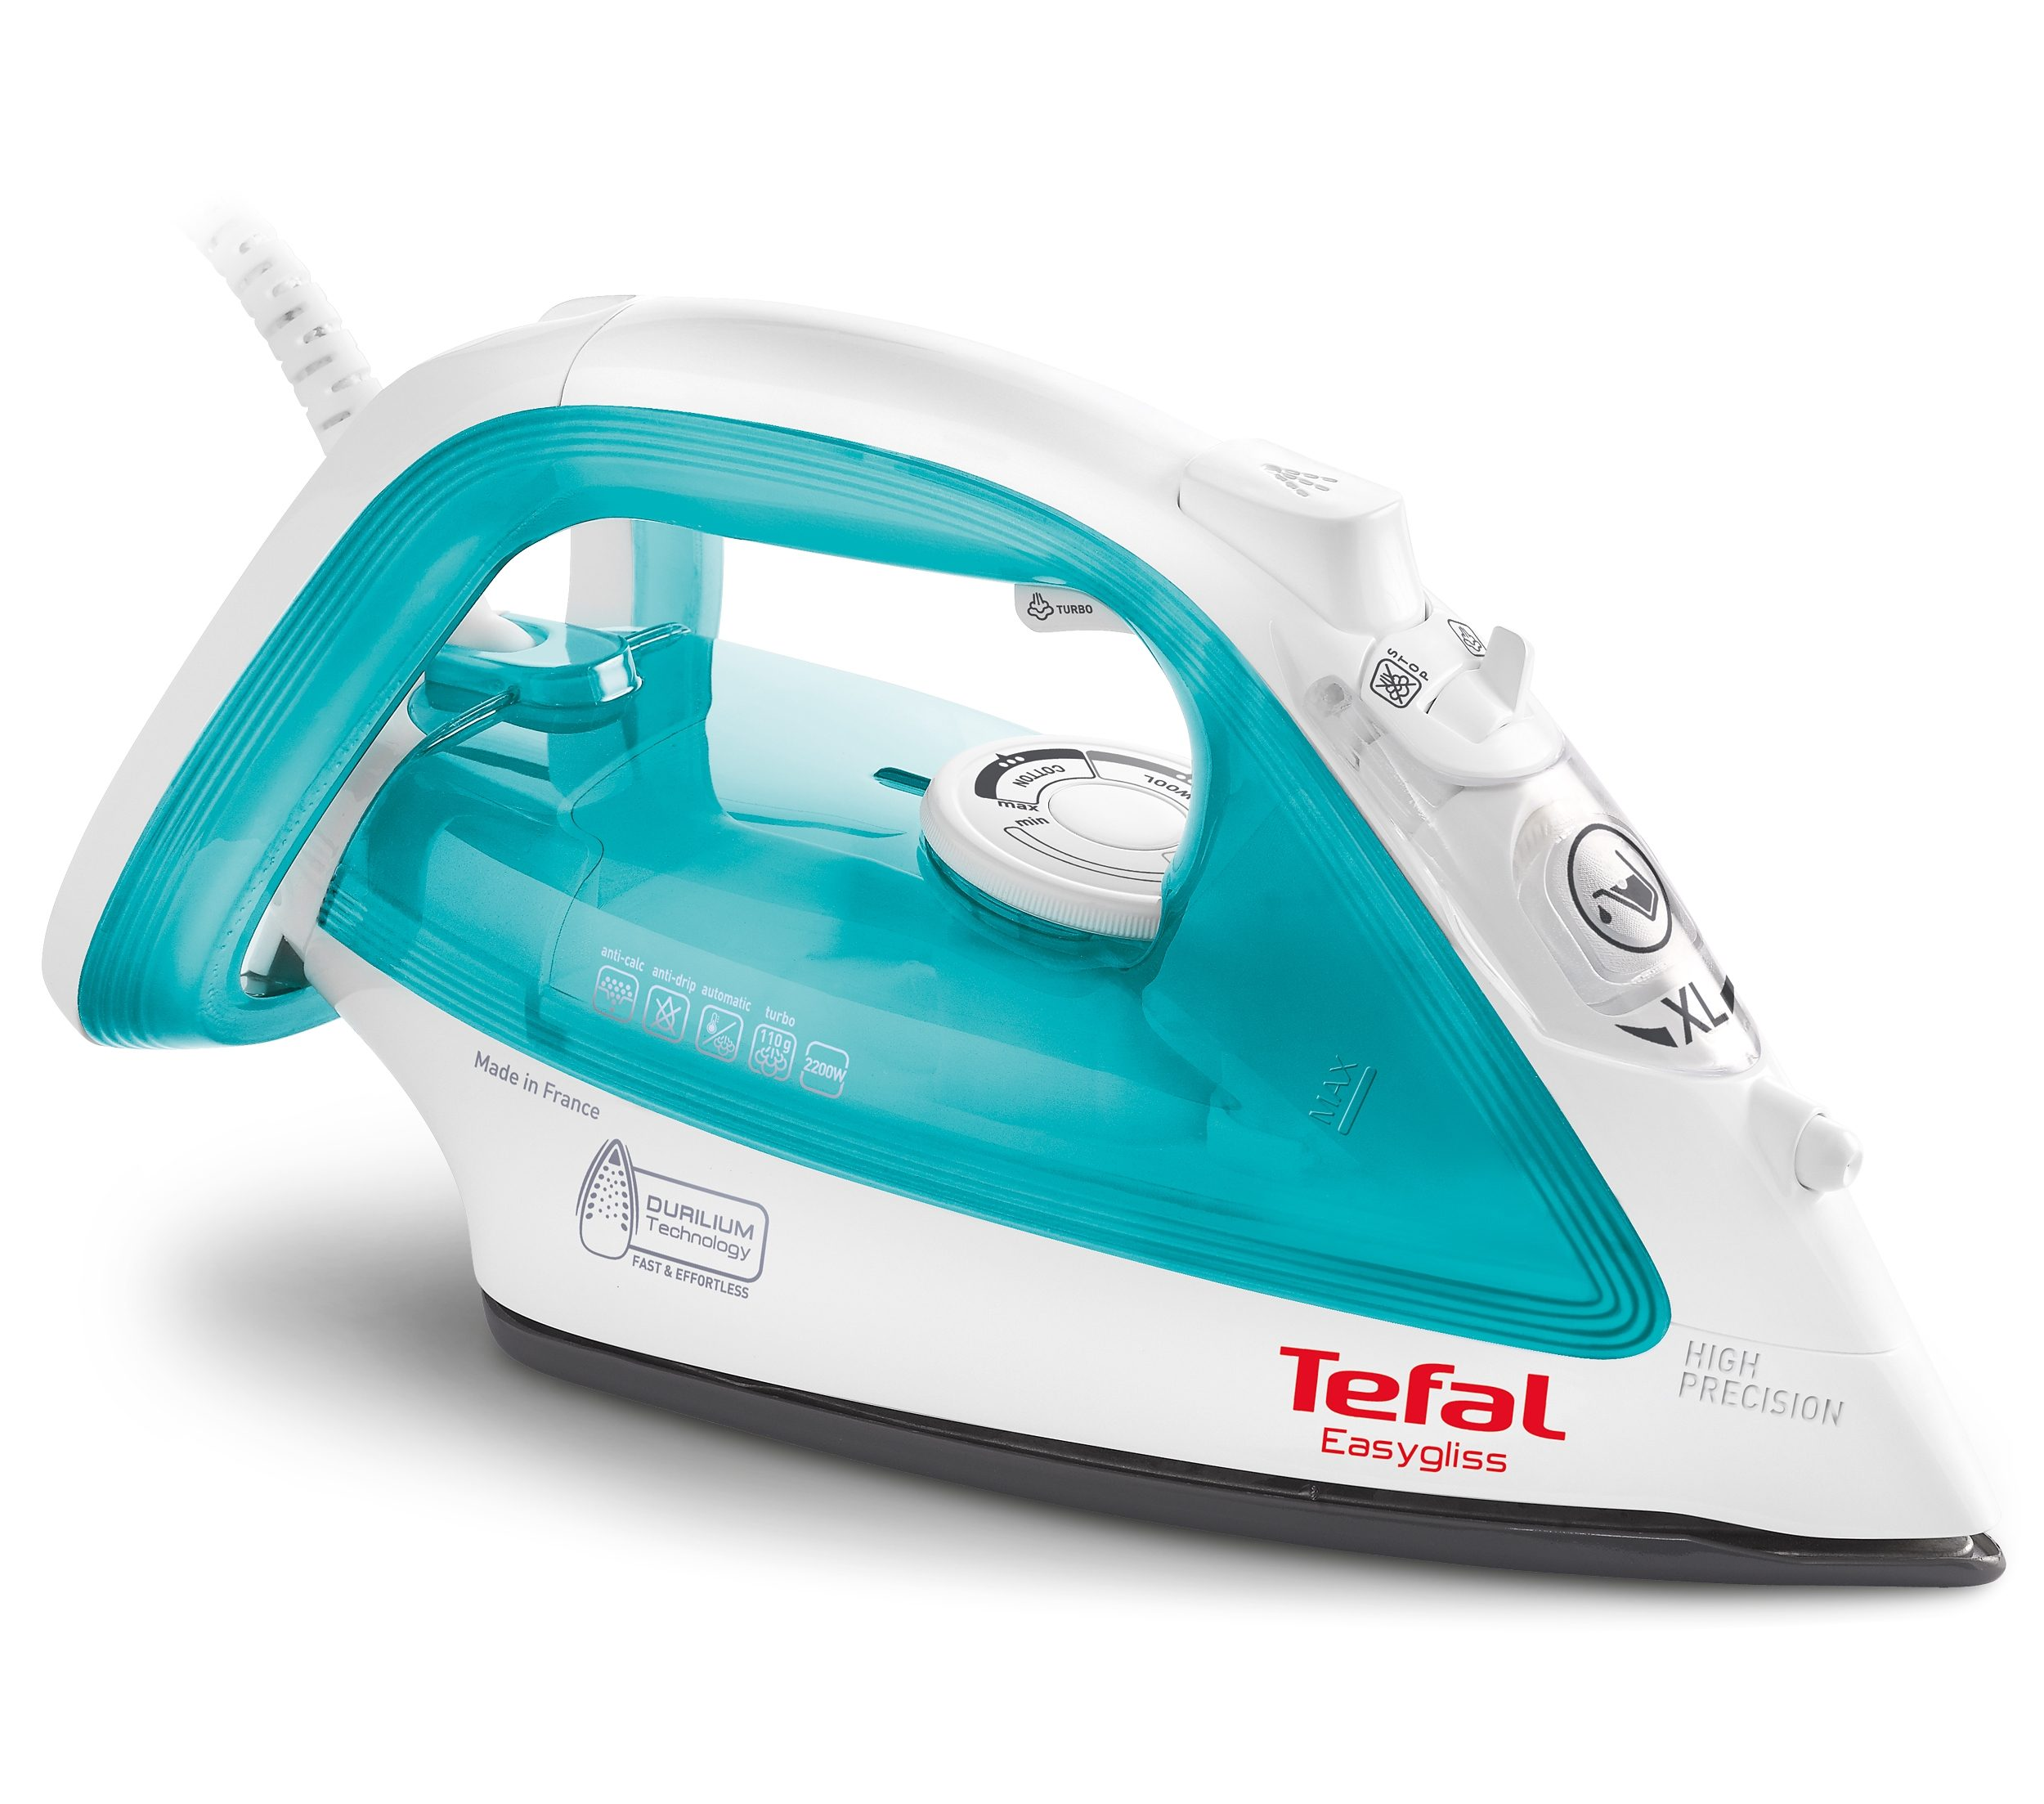 Tefal Bügeleisen EASYGLISS FV3910, mit Durilium Bügelsohle, 2200 Watt